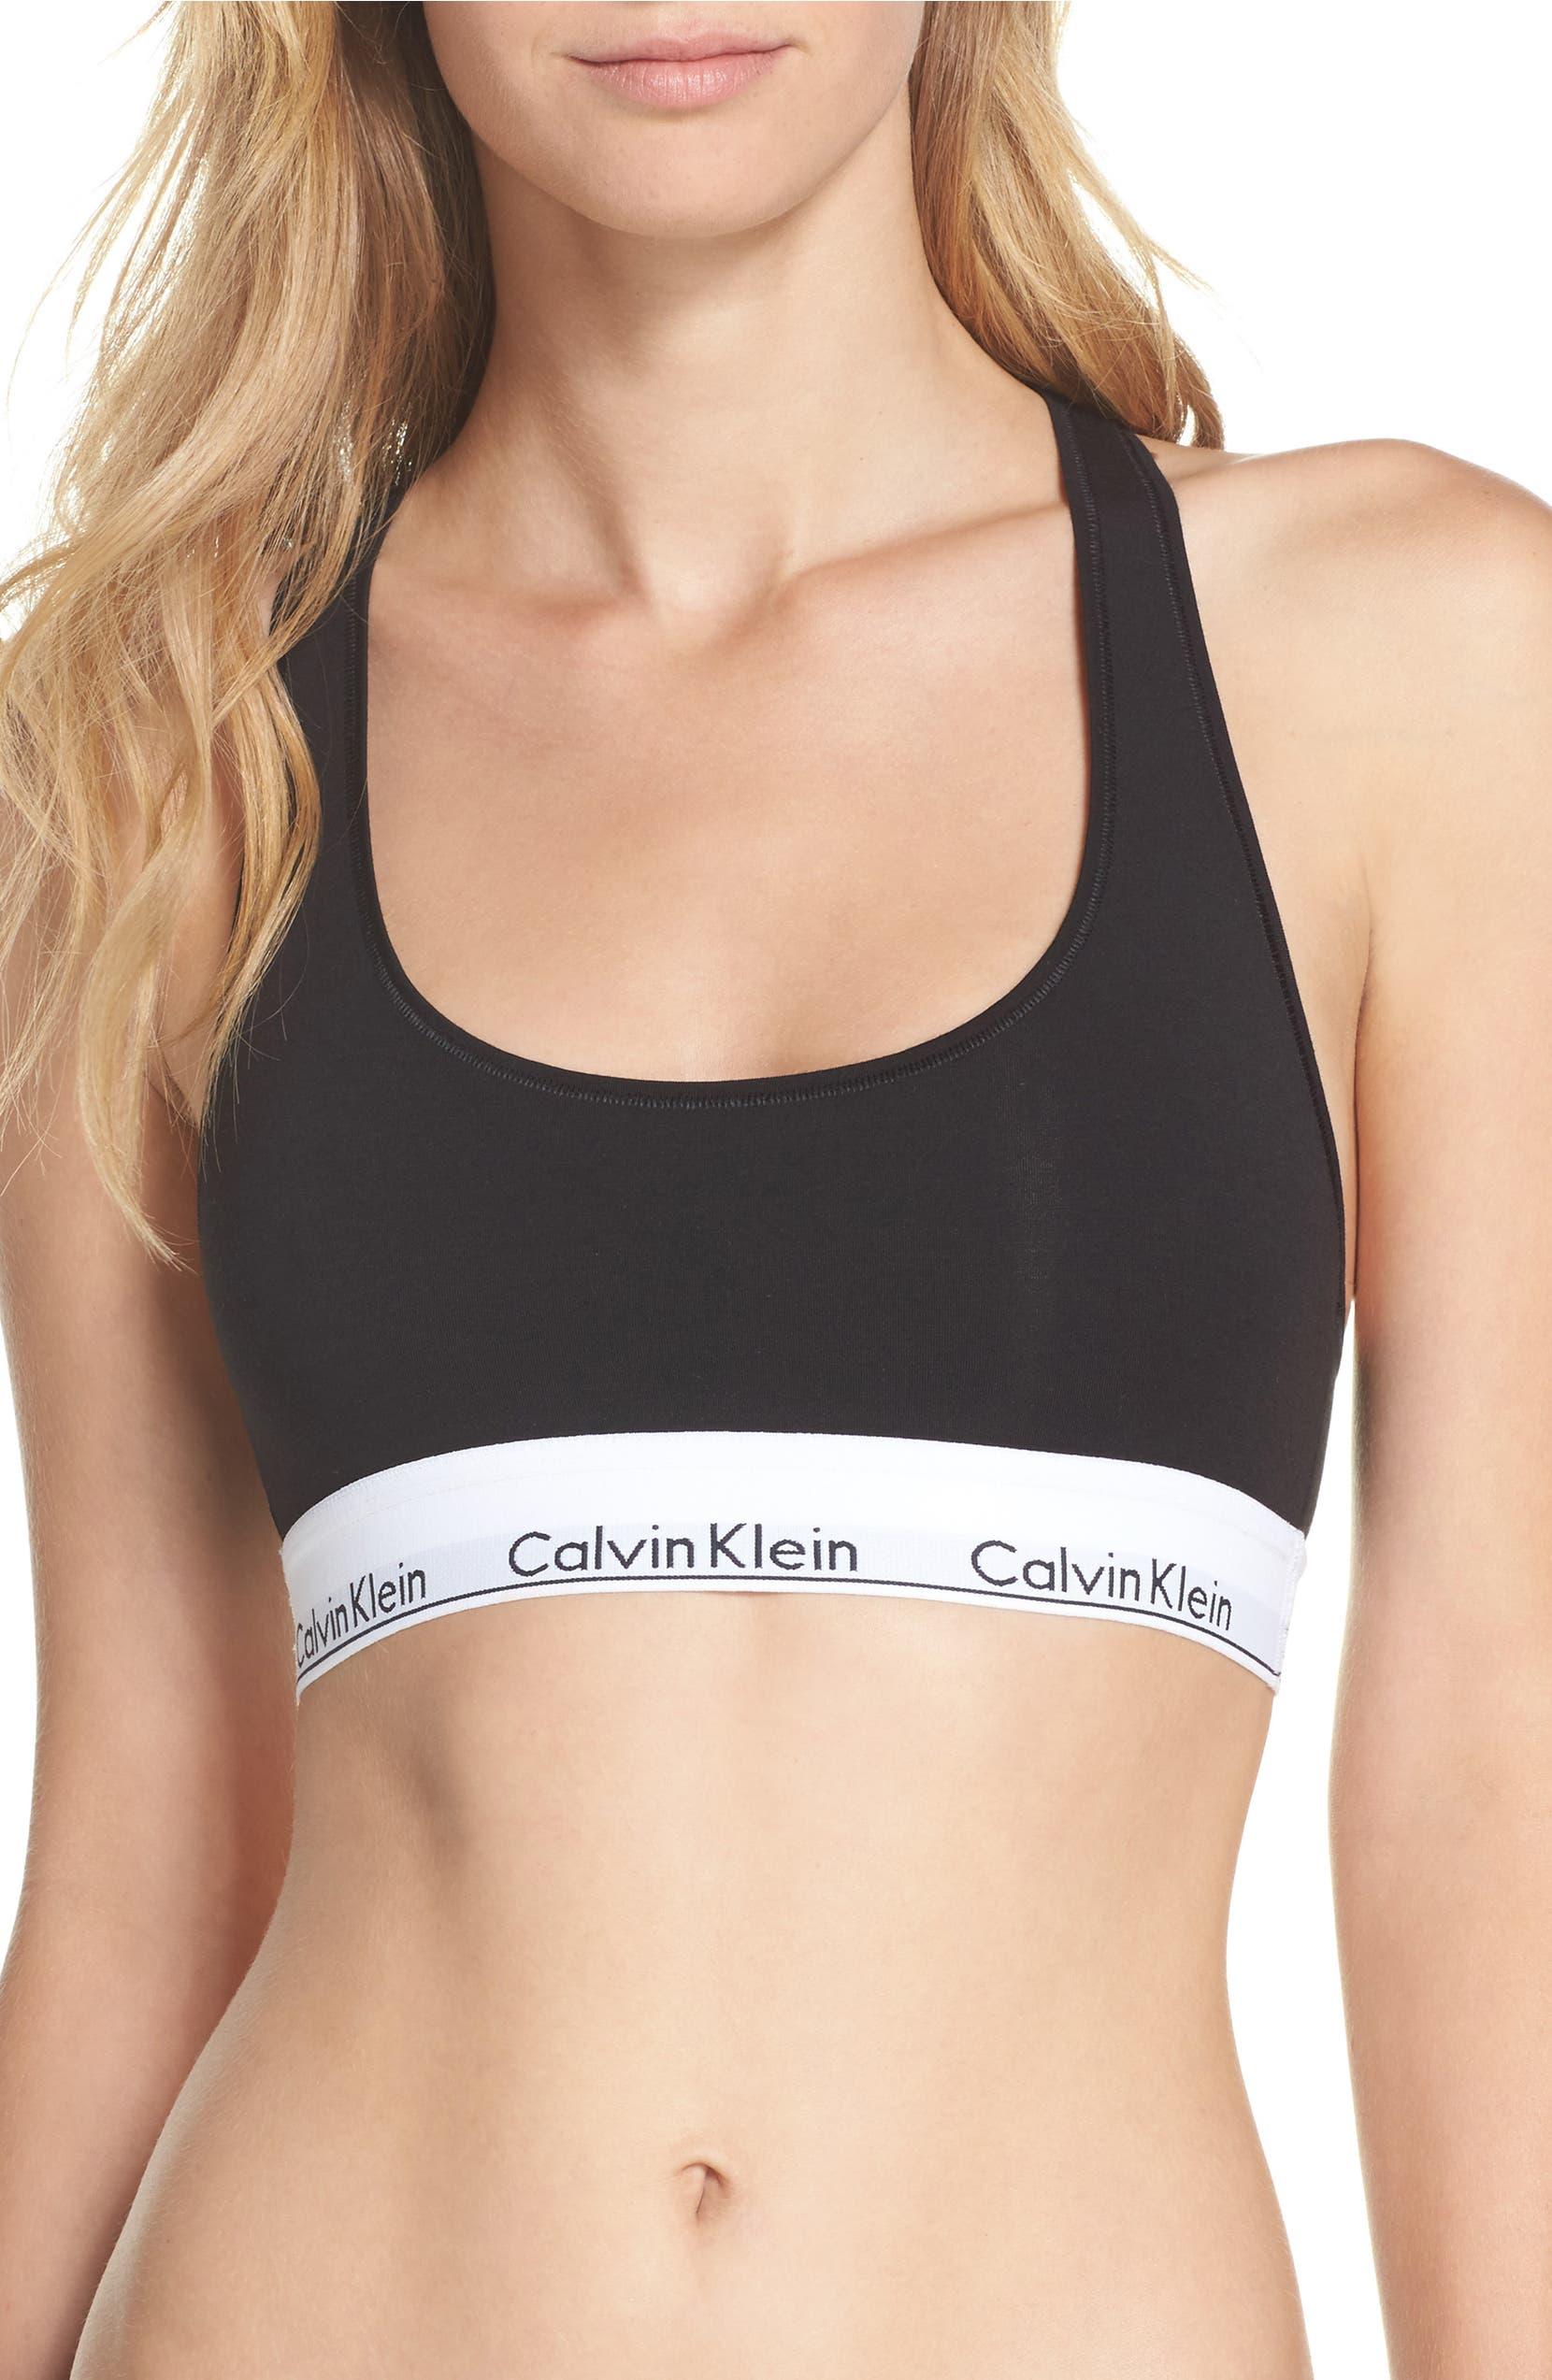 5ed70651909 Calvin Klein Modern Cotton Collection Cotton Blend Racerback Bralette